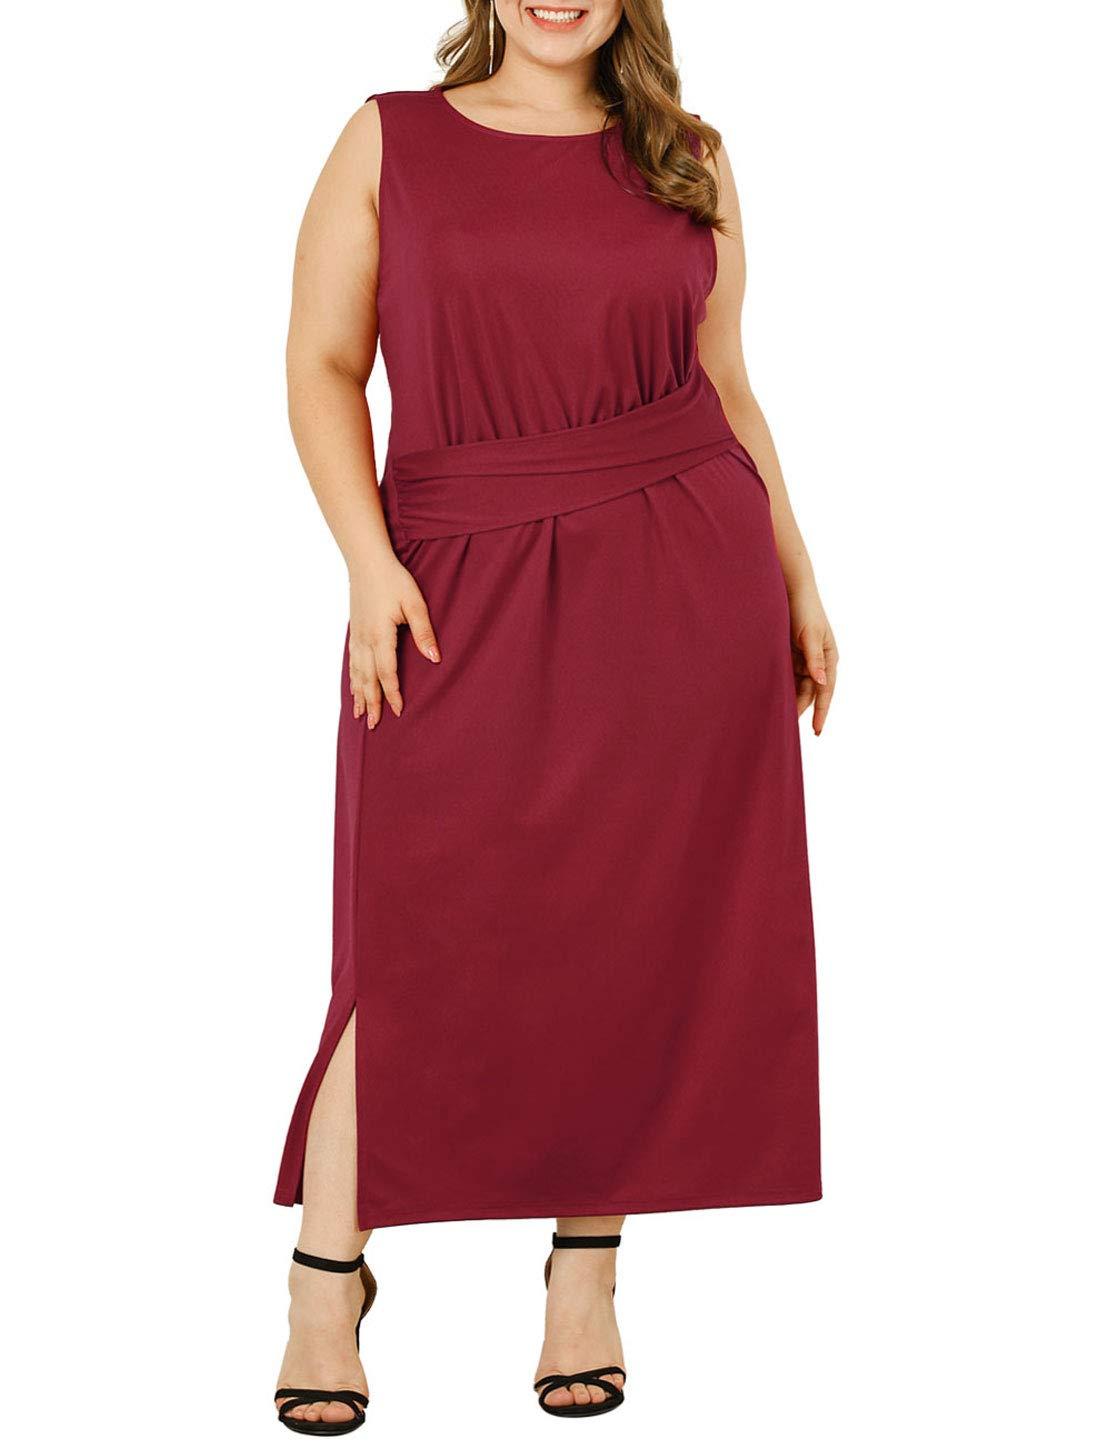 Agnes Orinda Women's Plus Size Elegant Dresses Draped Front Formal Dress